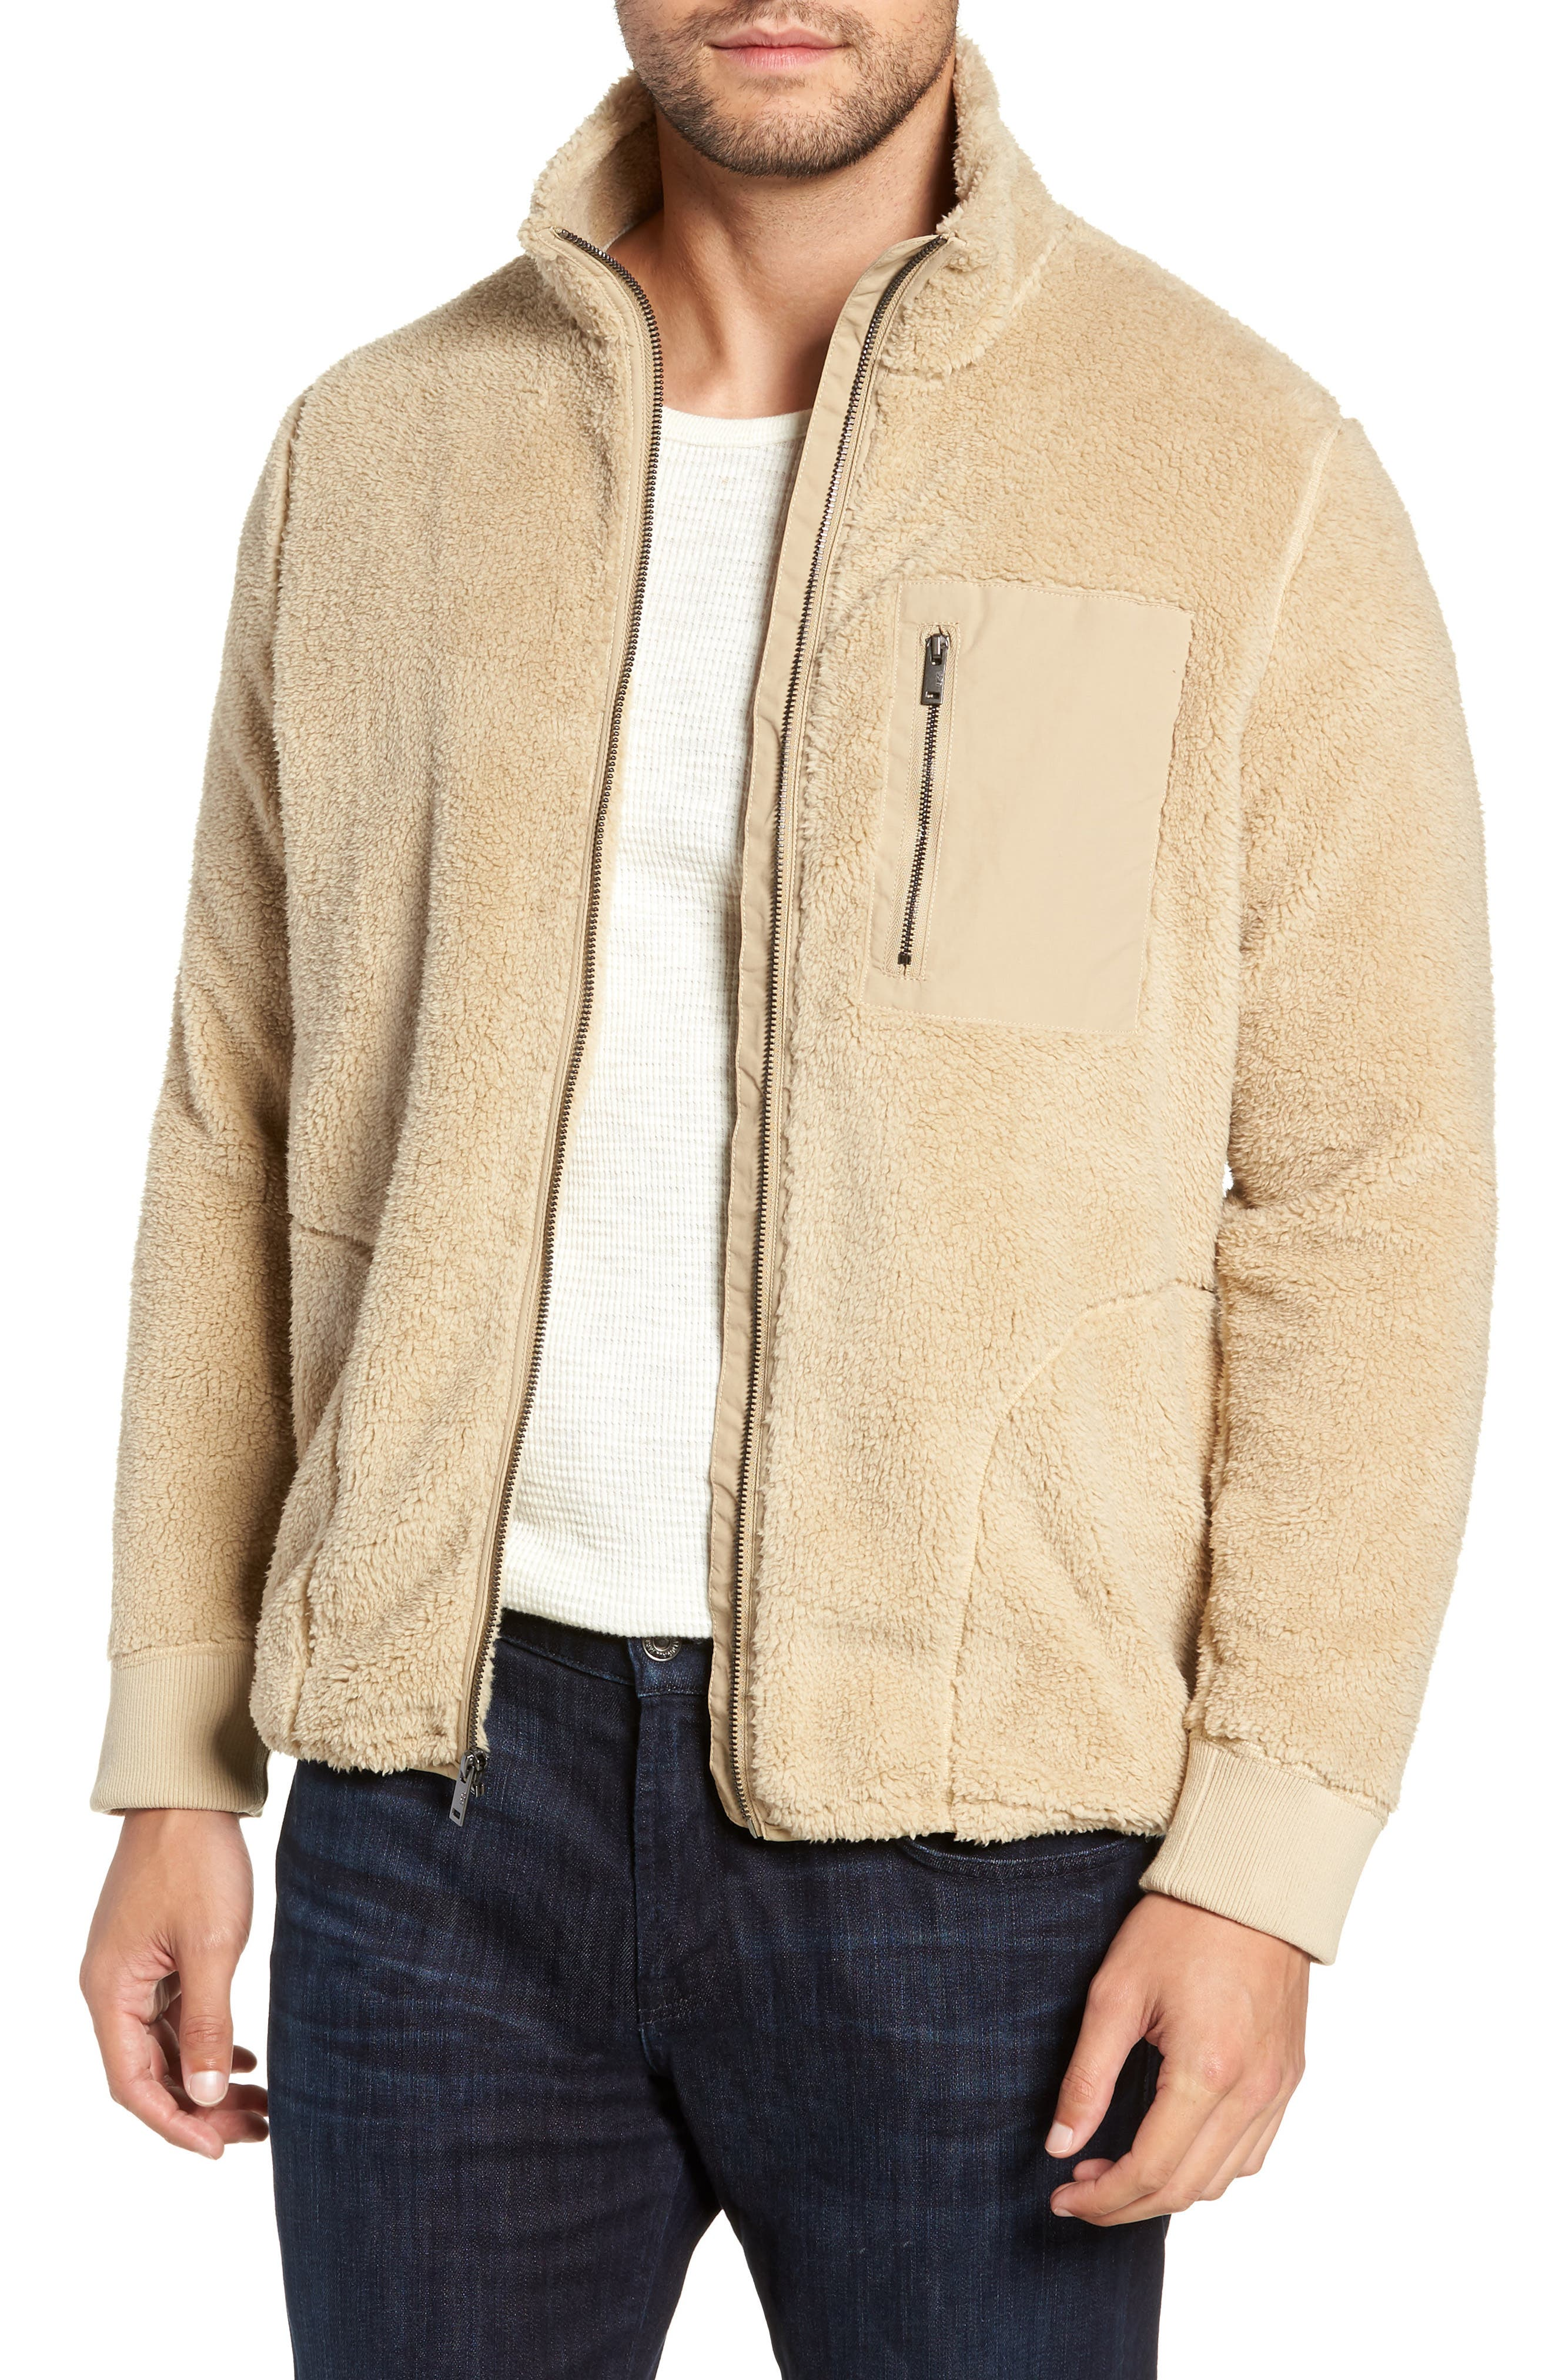 Lucas High Pile Fleece Sweater Jacket,                         Main,                         color, SAND